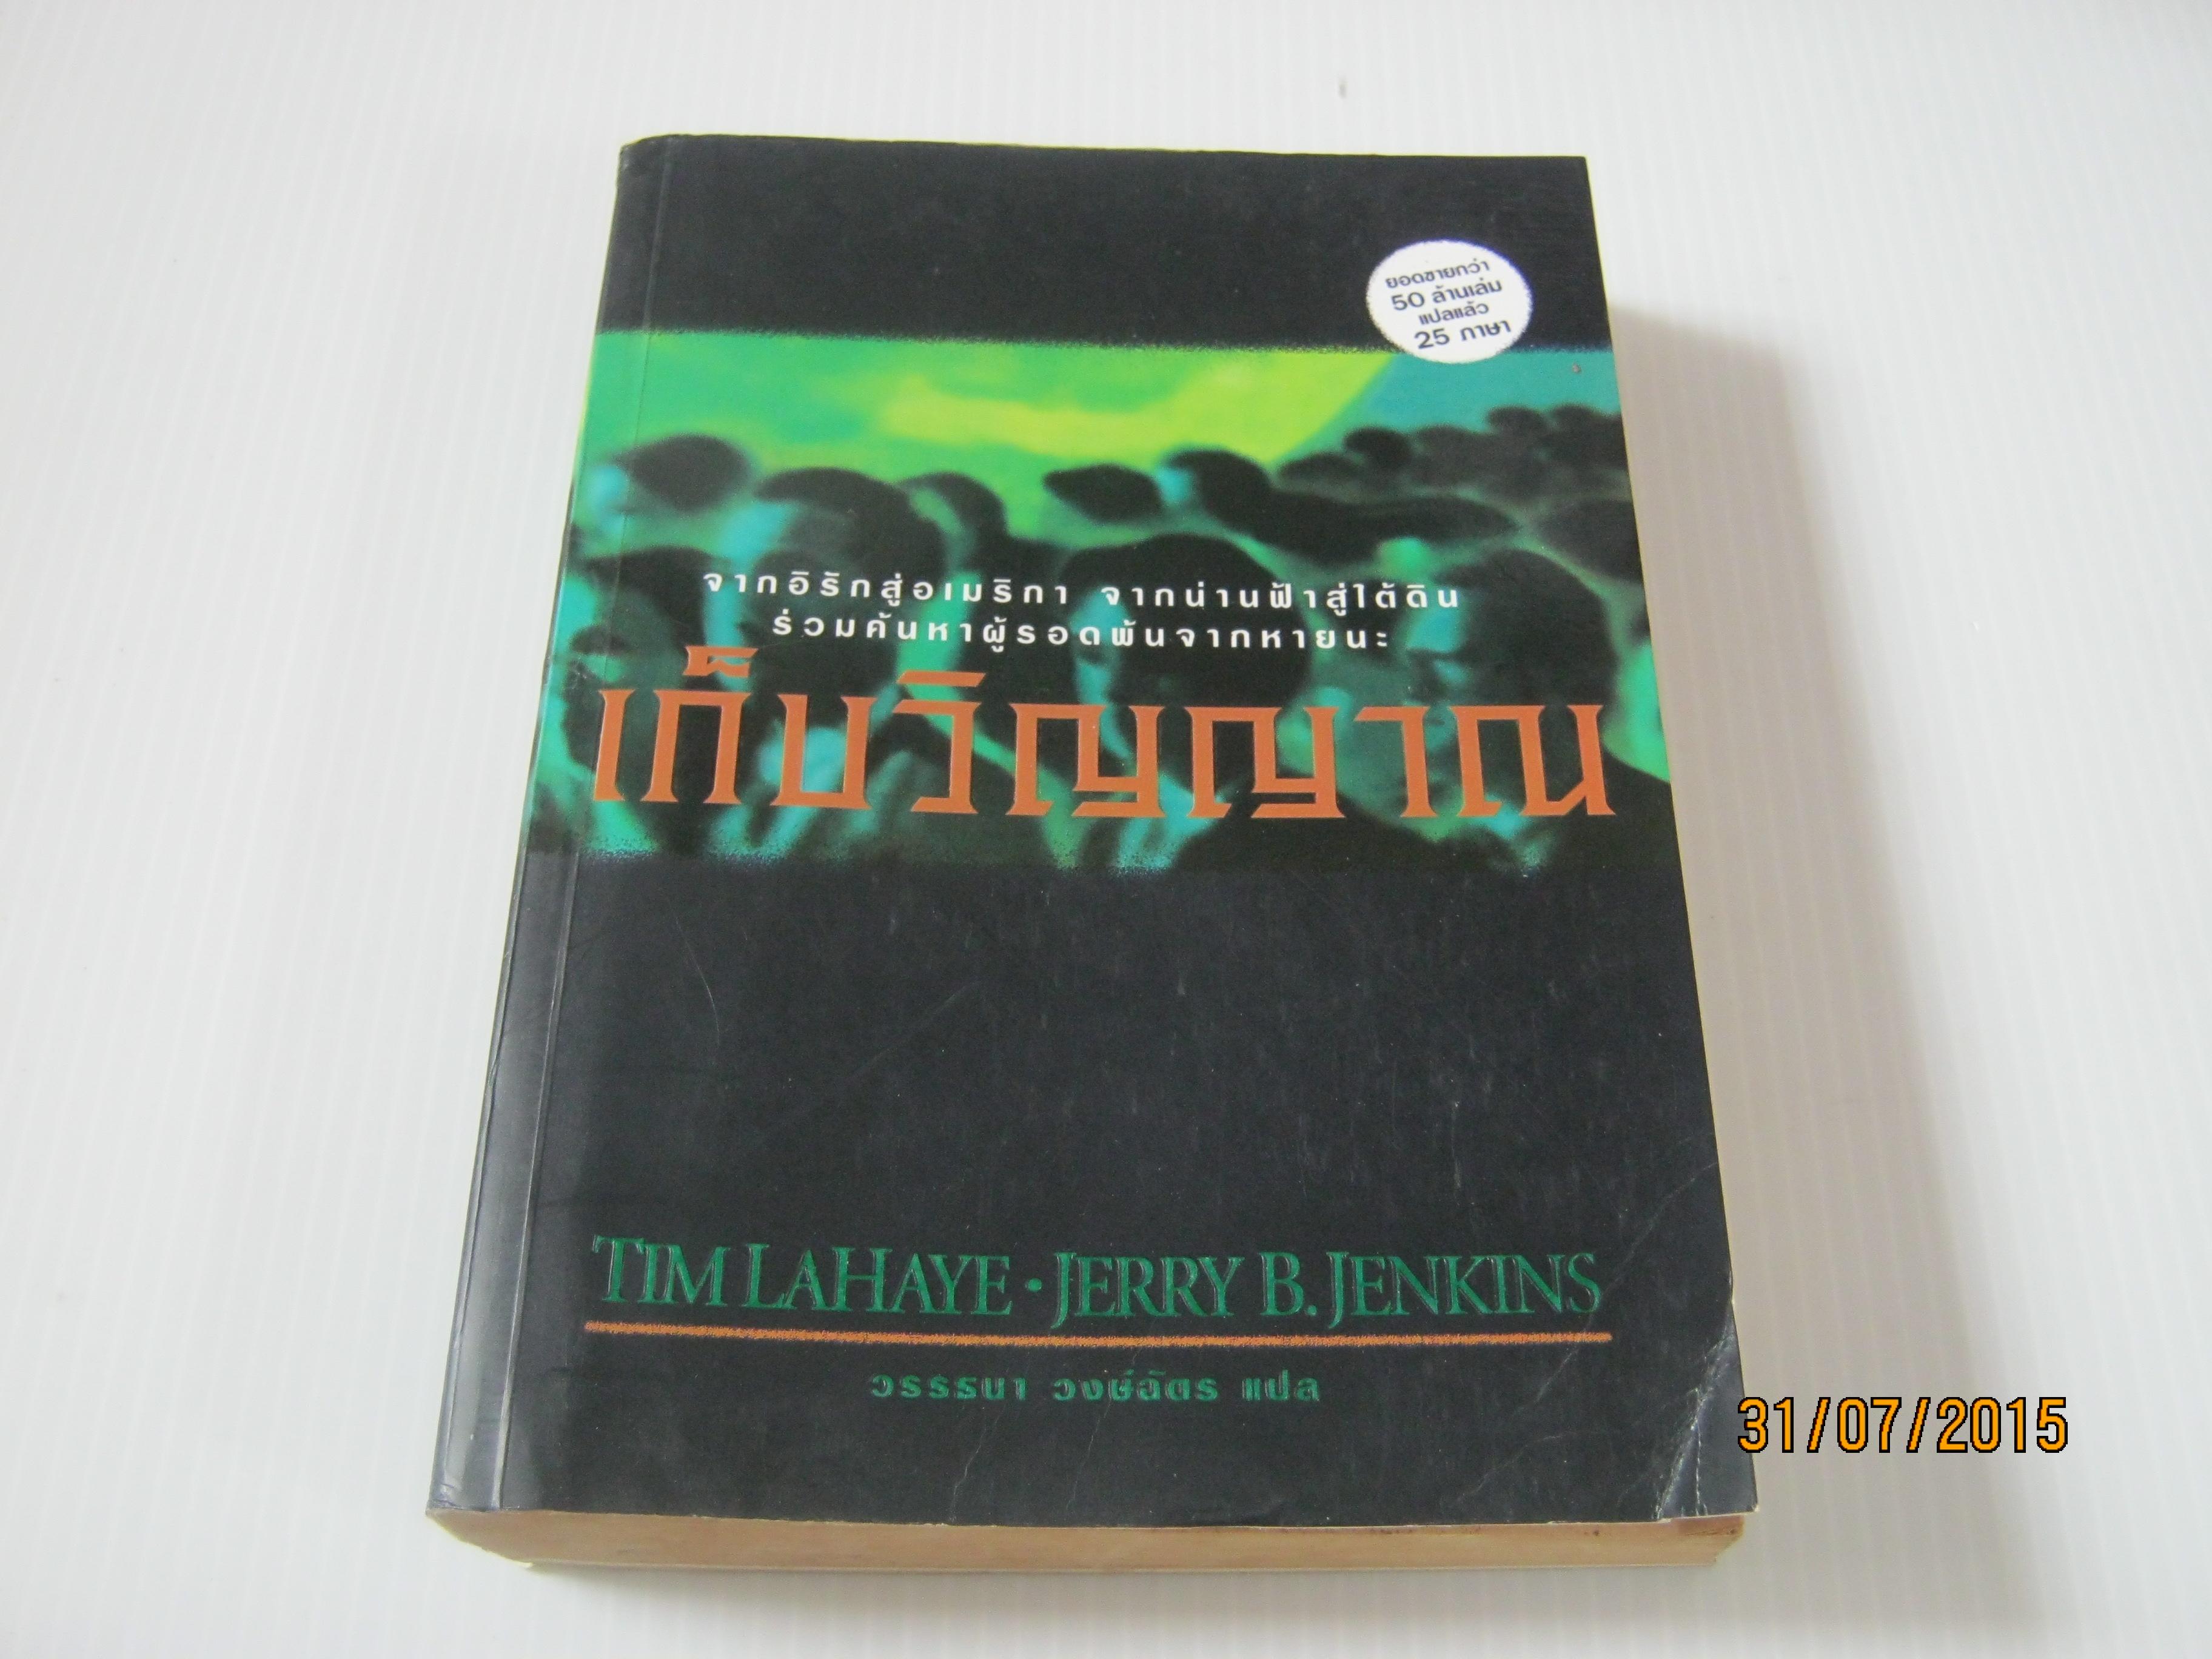 Left Behind ตอน เก็บวิญญาณ Tim LaHaye & Jerry B.Jenkins เขียน วรรธนา วงษ์ฉัตร แปล